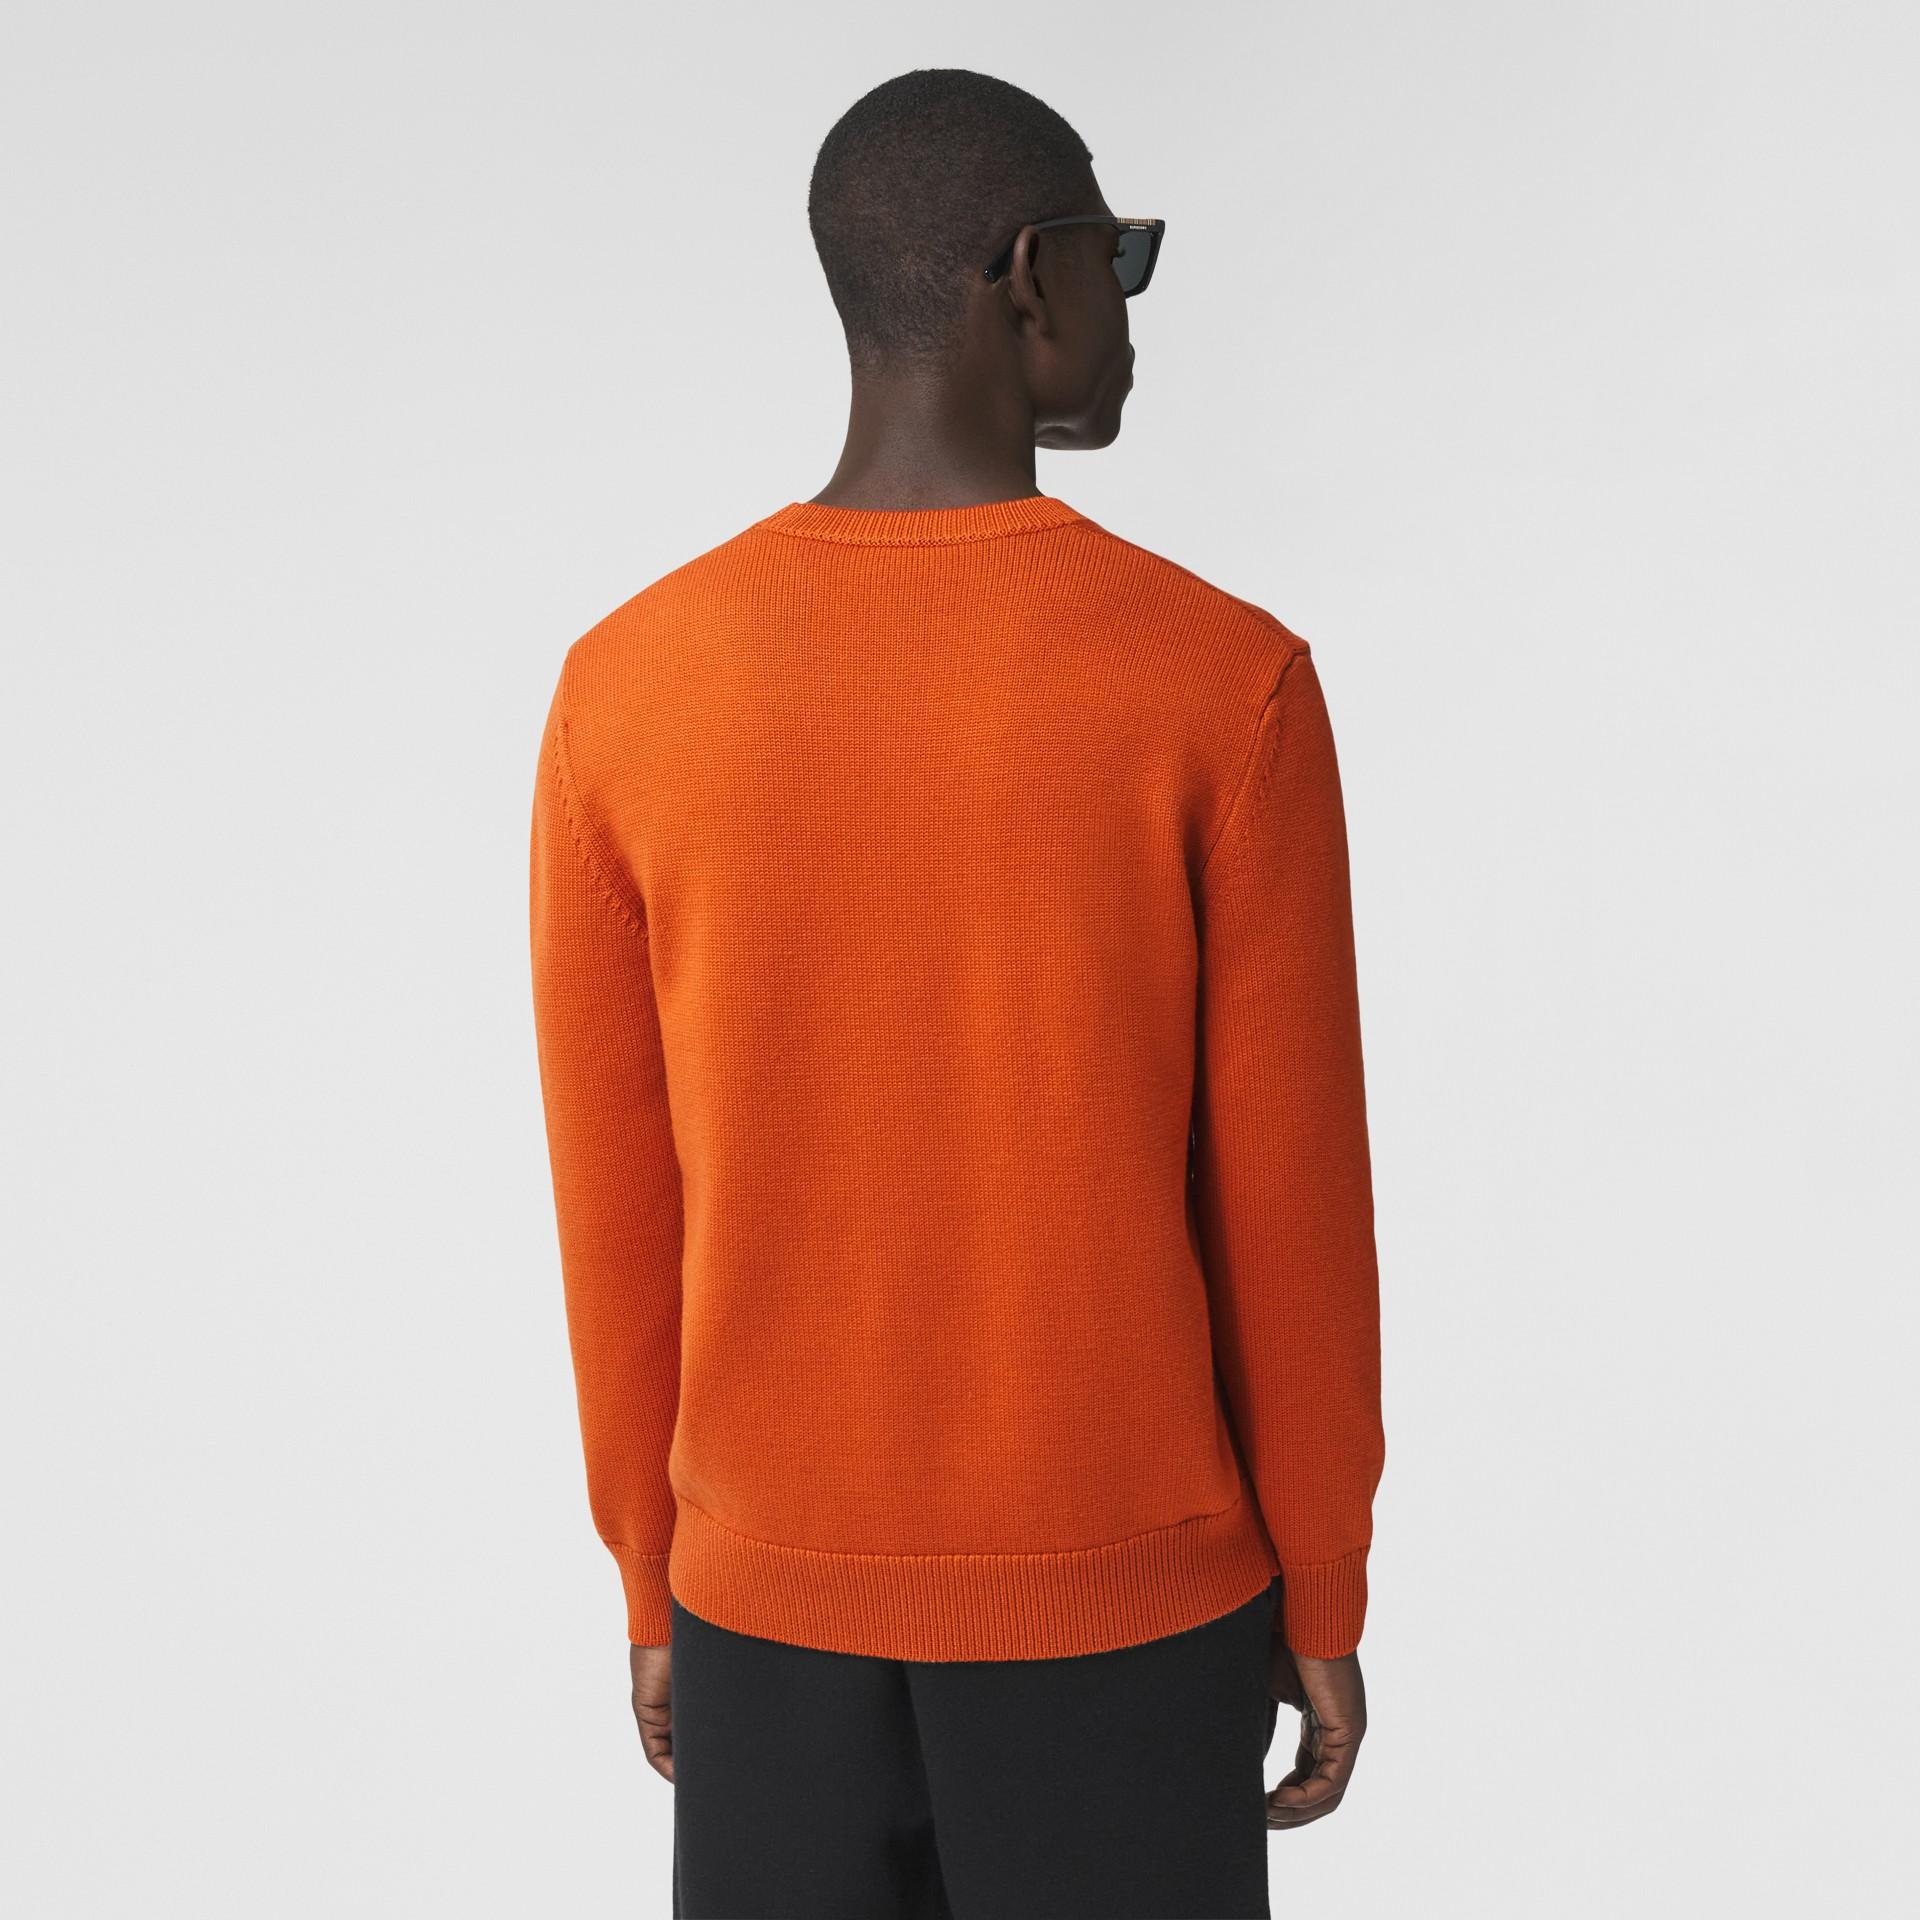 Varsity Graphic Merino Wool Jacquard Sweater in Burnt Orange - Men   Burberry - gallery image 2